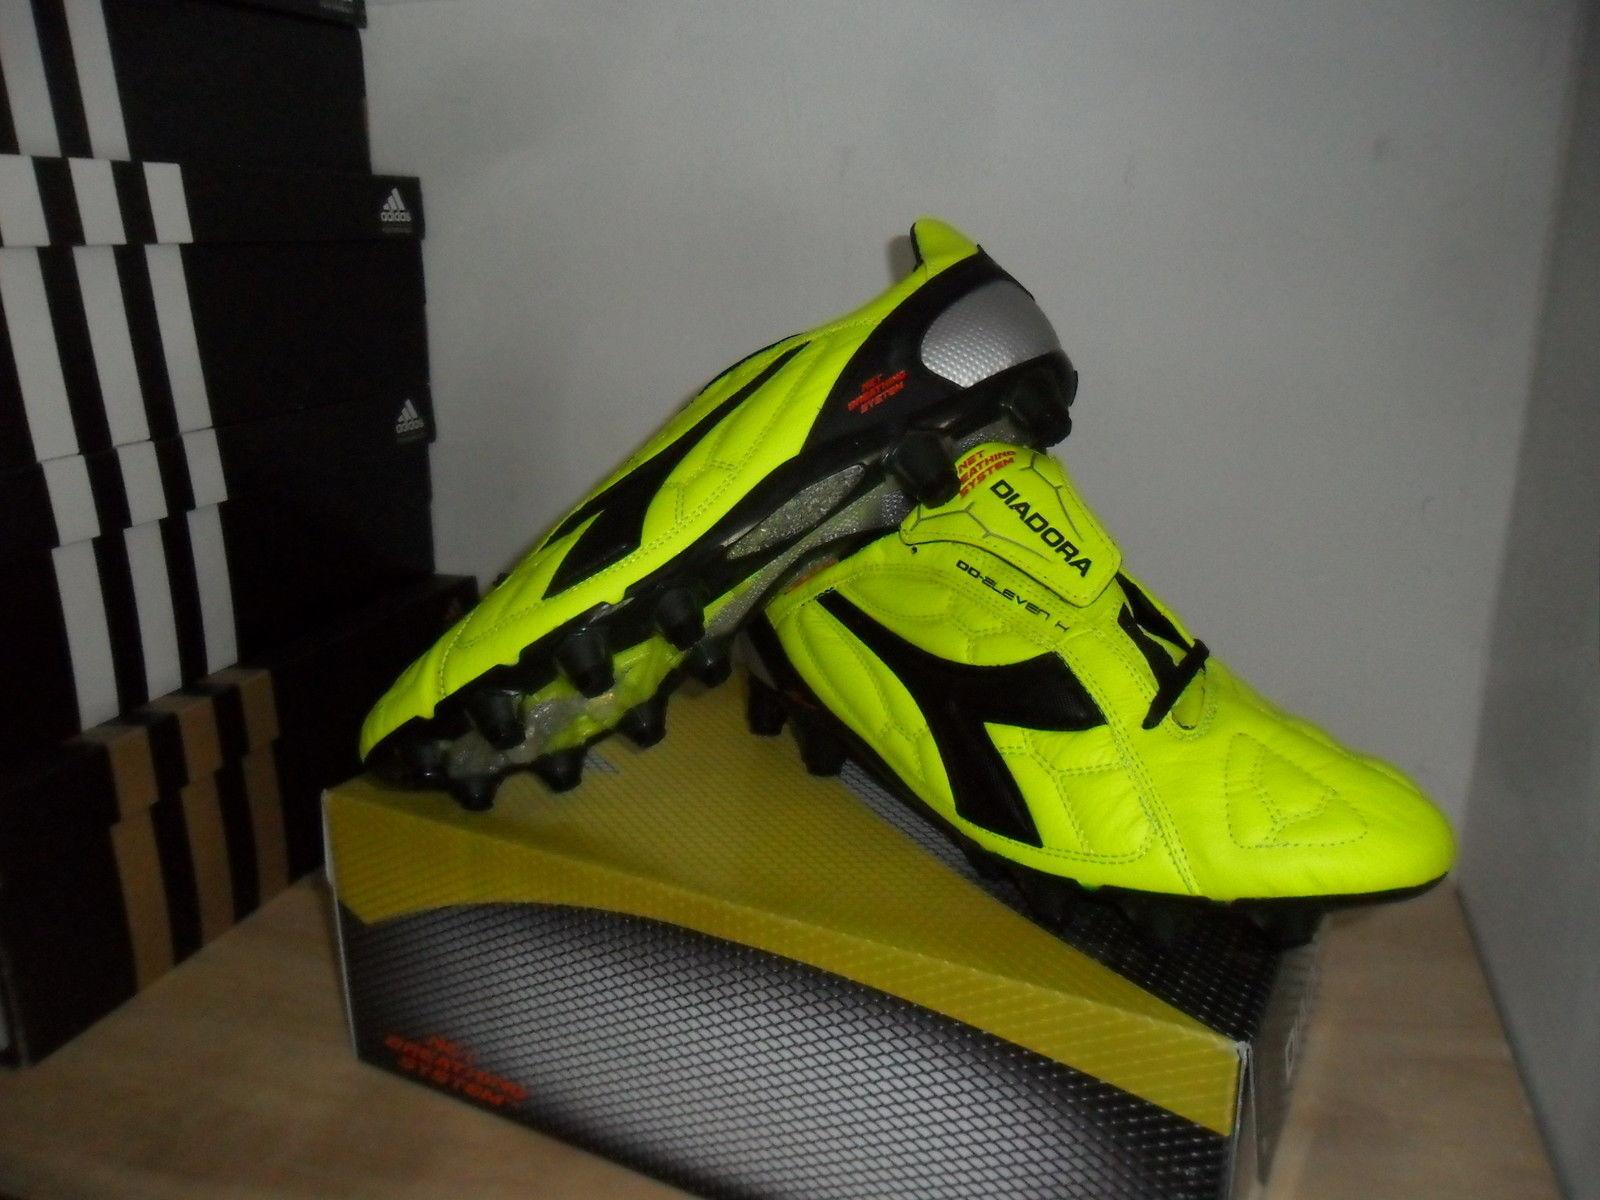 FW17 DIADORA SCARPINI DD-ELEVEN K GX14 schuhe CALCIO FOOTBALL Stiefel155978 C0001